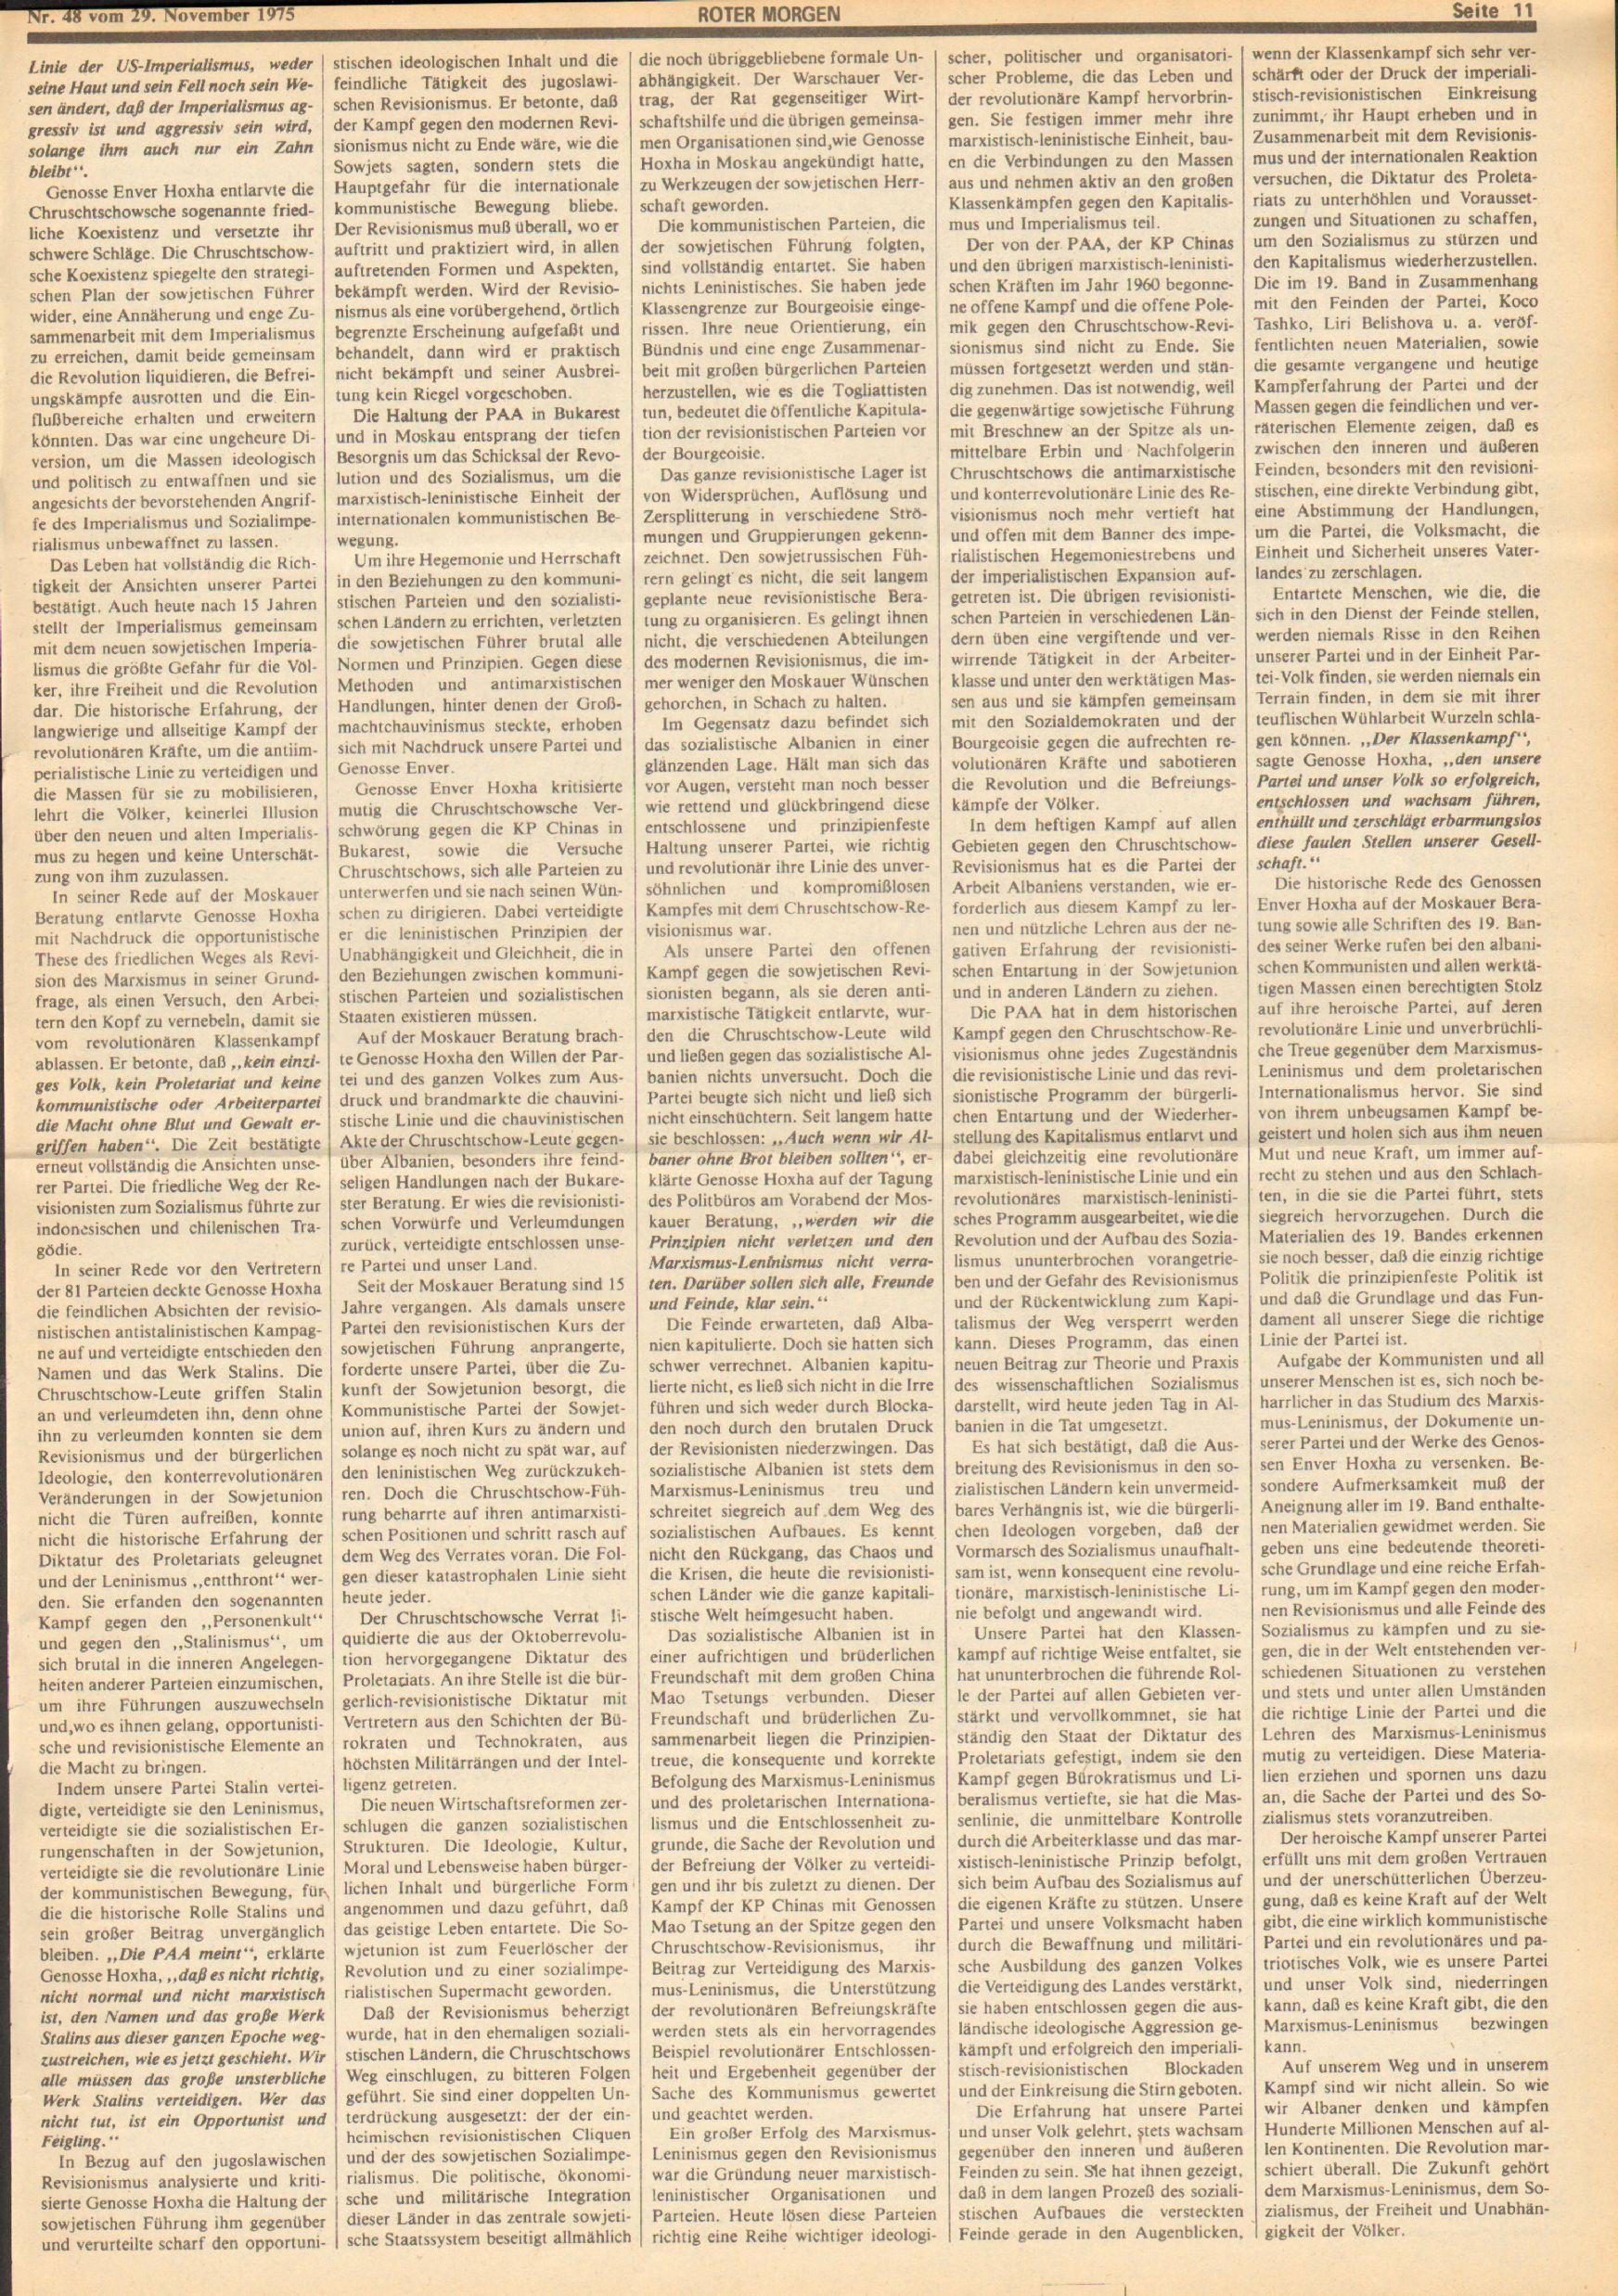 Roter Morgen, 9. Jg., 29. November 1975, Nr. 48, Seite 11